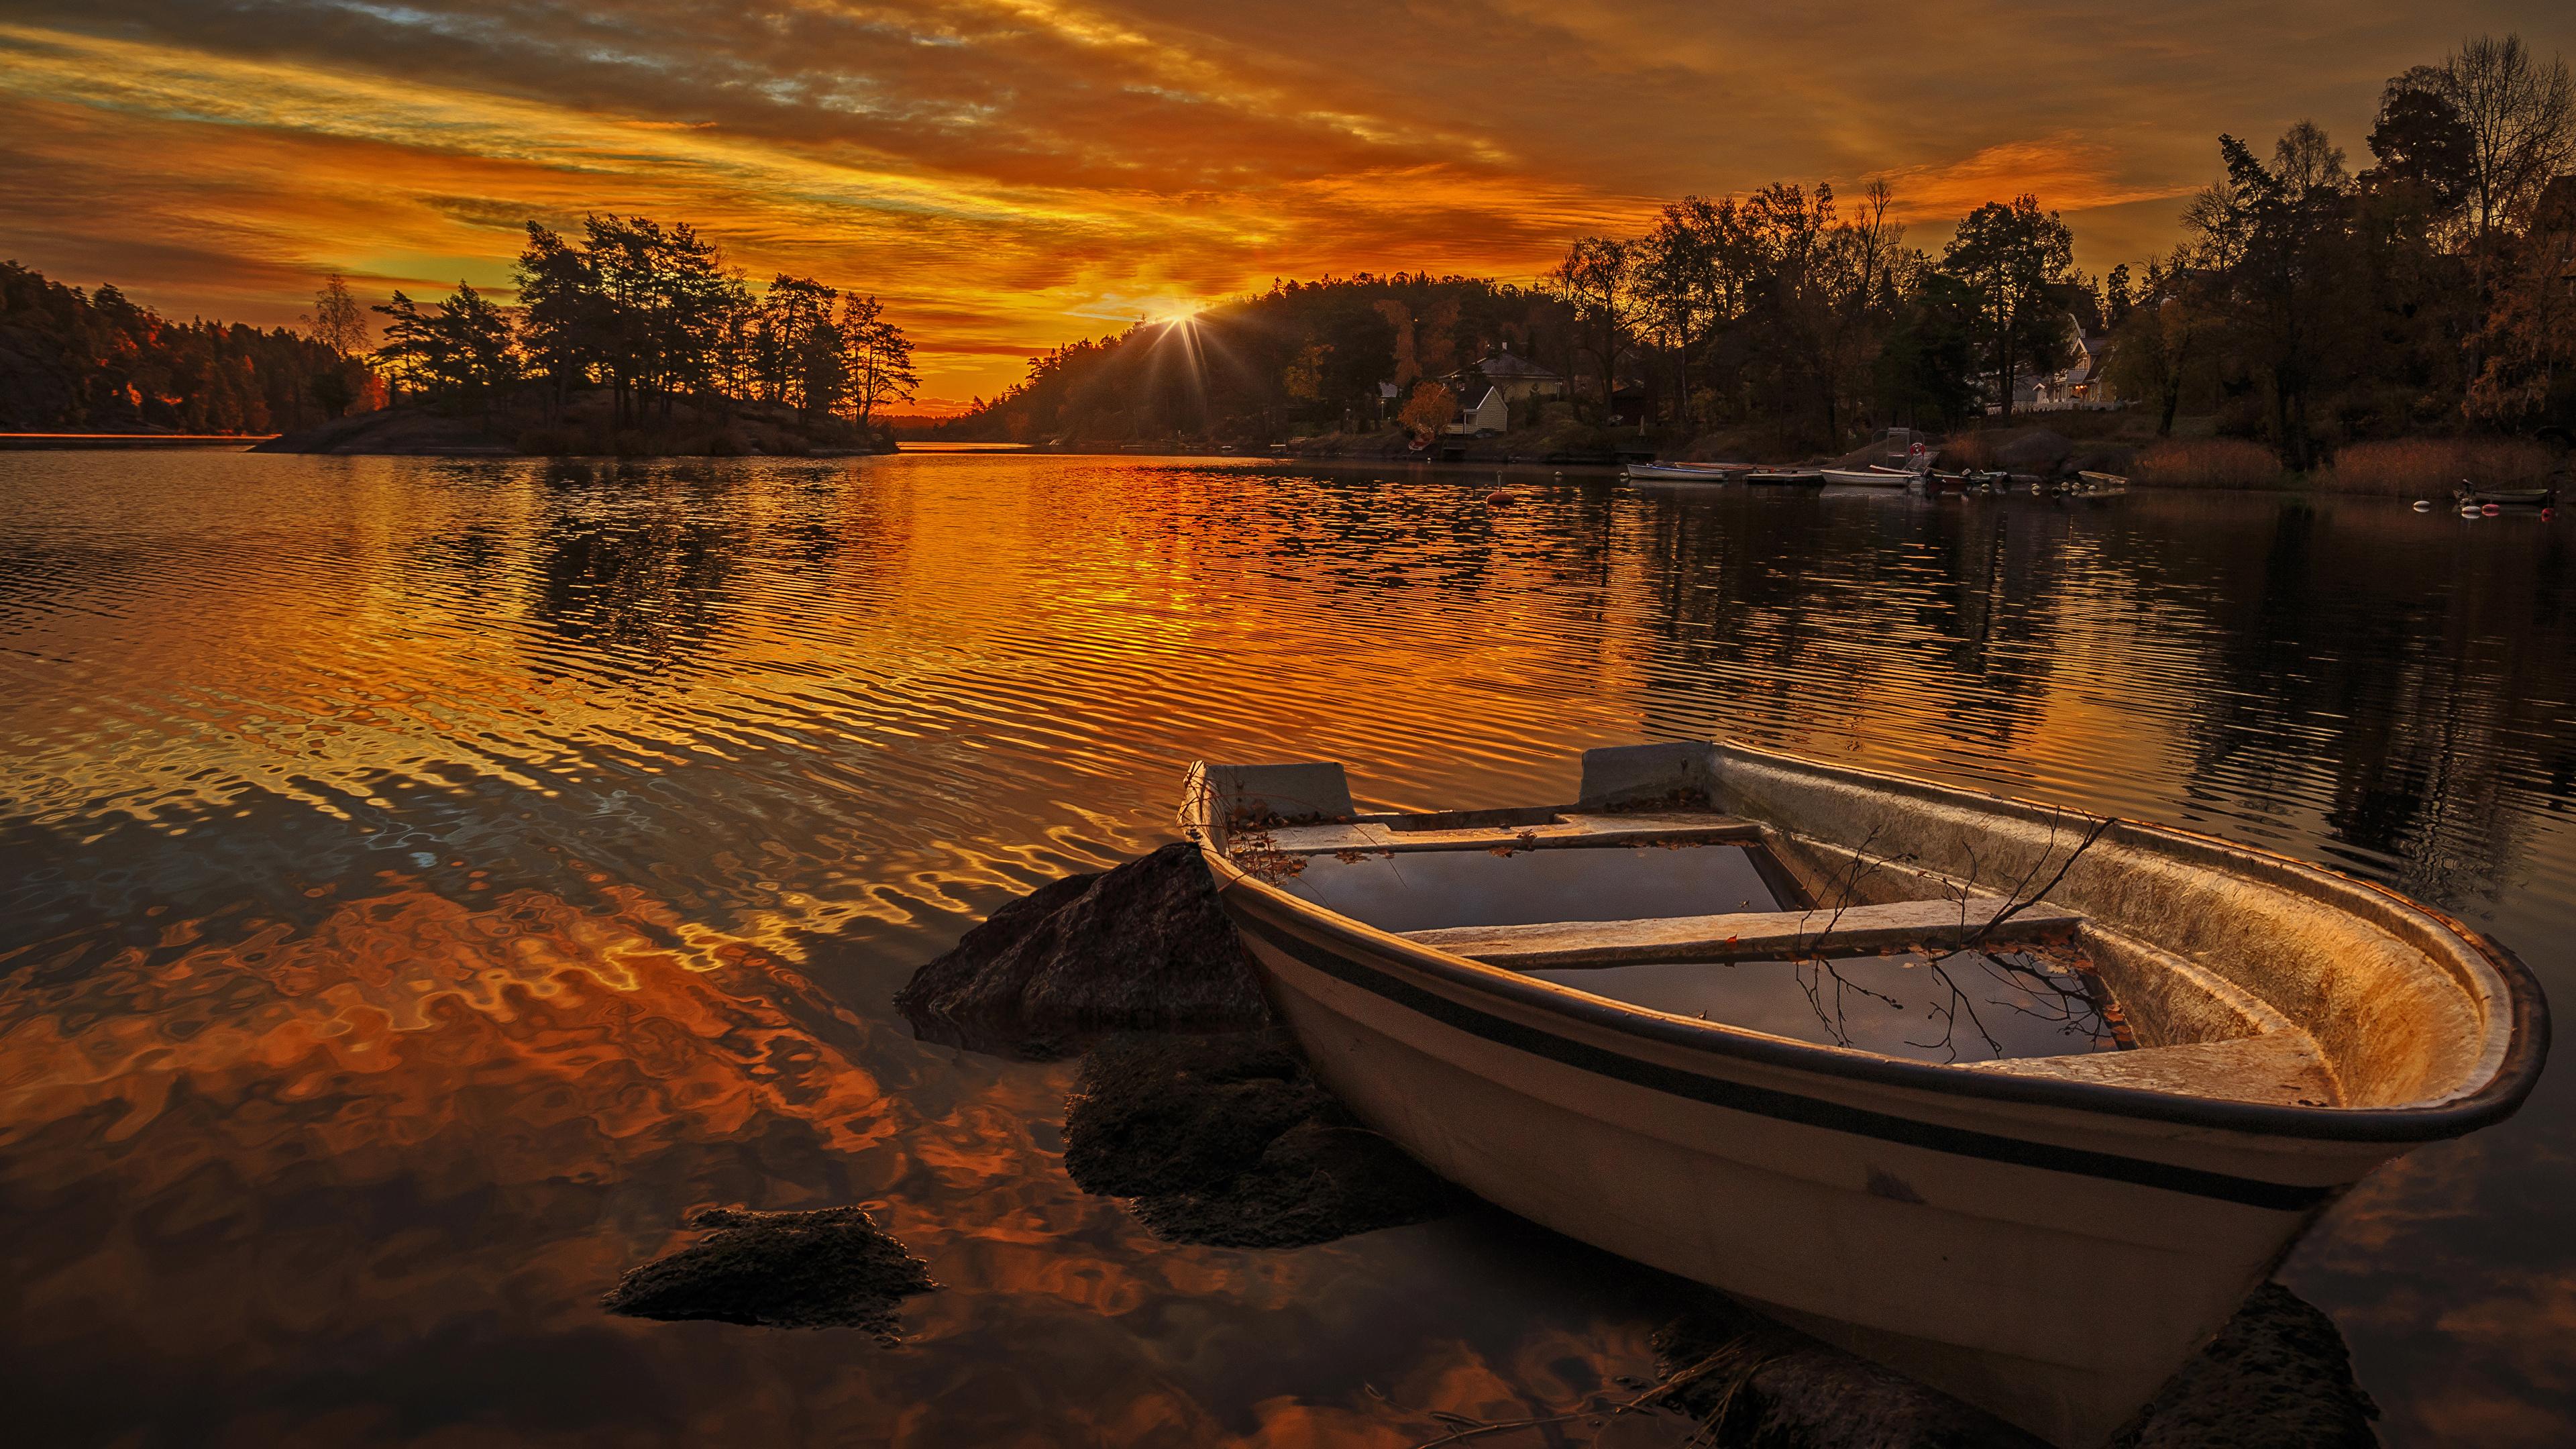 Озеро на закате скачать